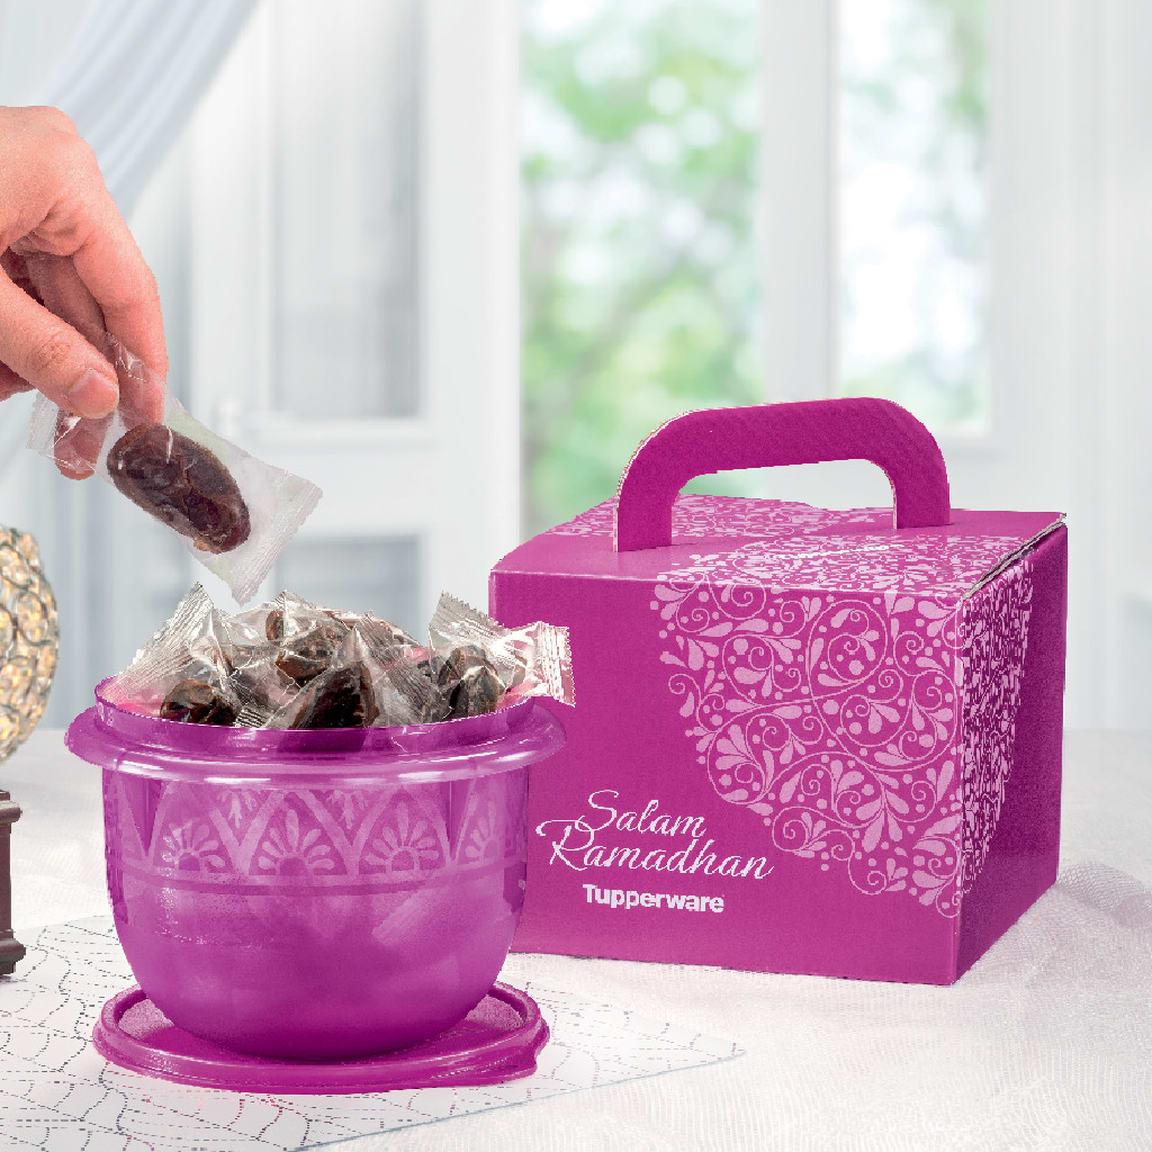 Date-licious Kurma Gift Box